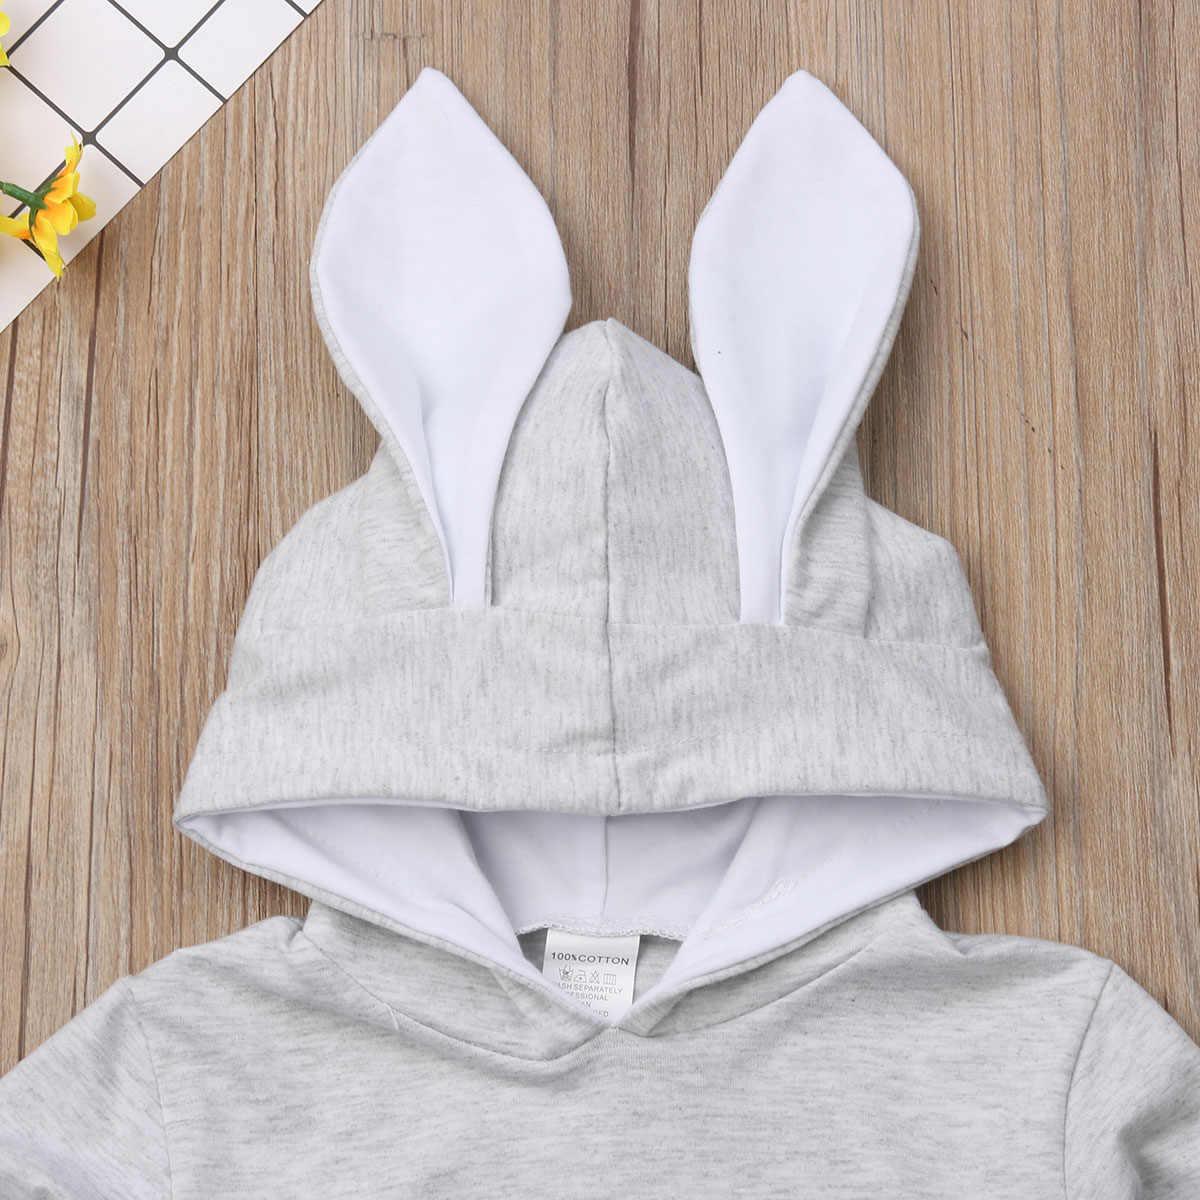 2019 New Toddler Baby Girl Kid Cute Hoodies Coat Rabbit Ear Bunny Hoodie Pullover Grey Coat Jacket Outwear Snowsuit Clothes 1-6Y